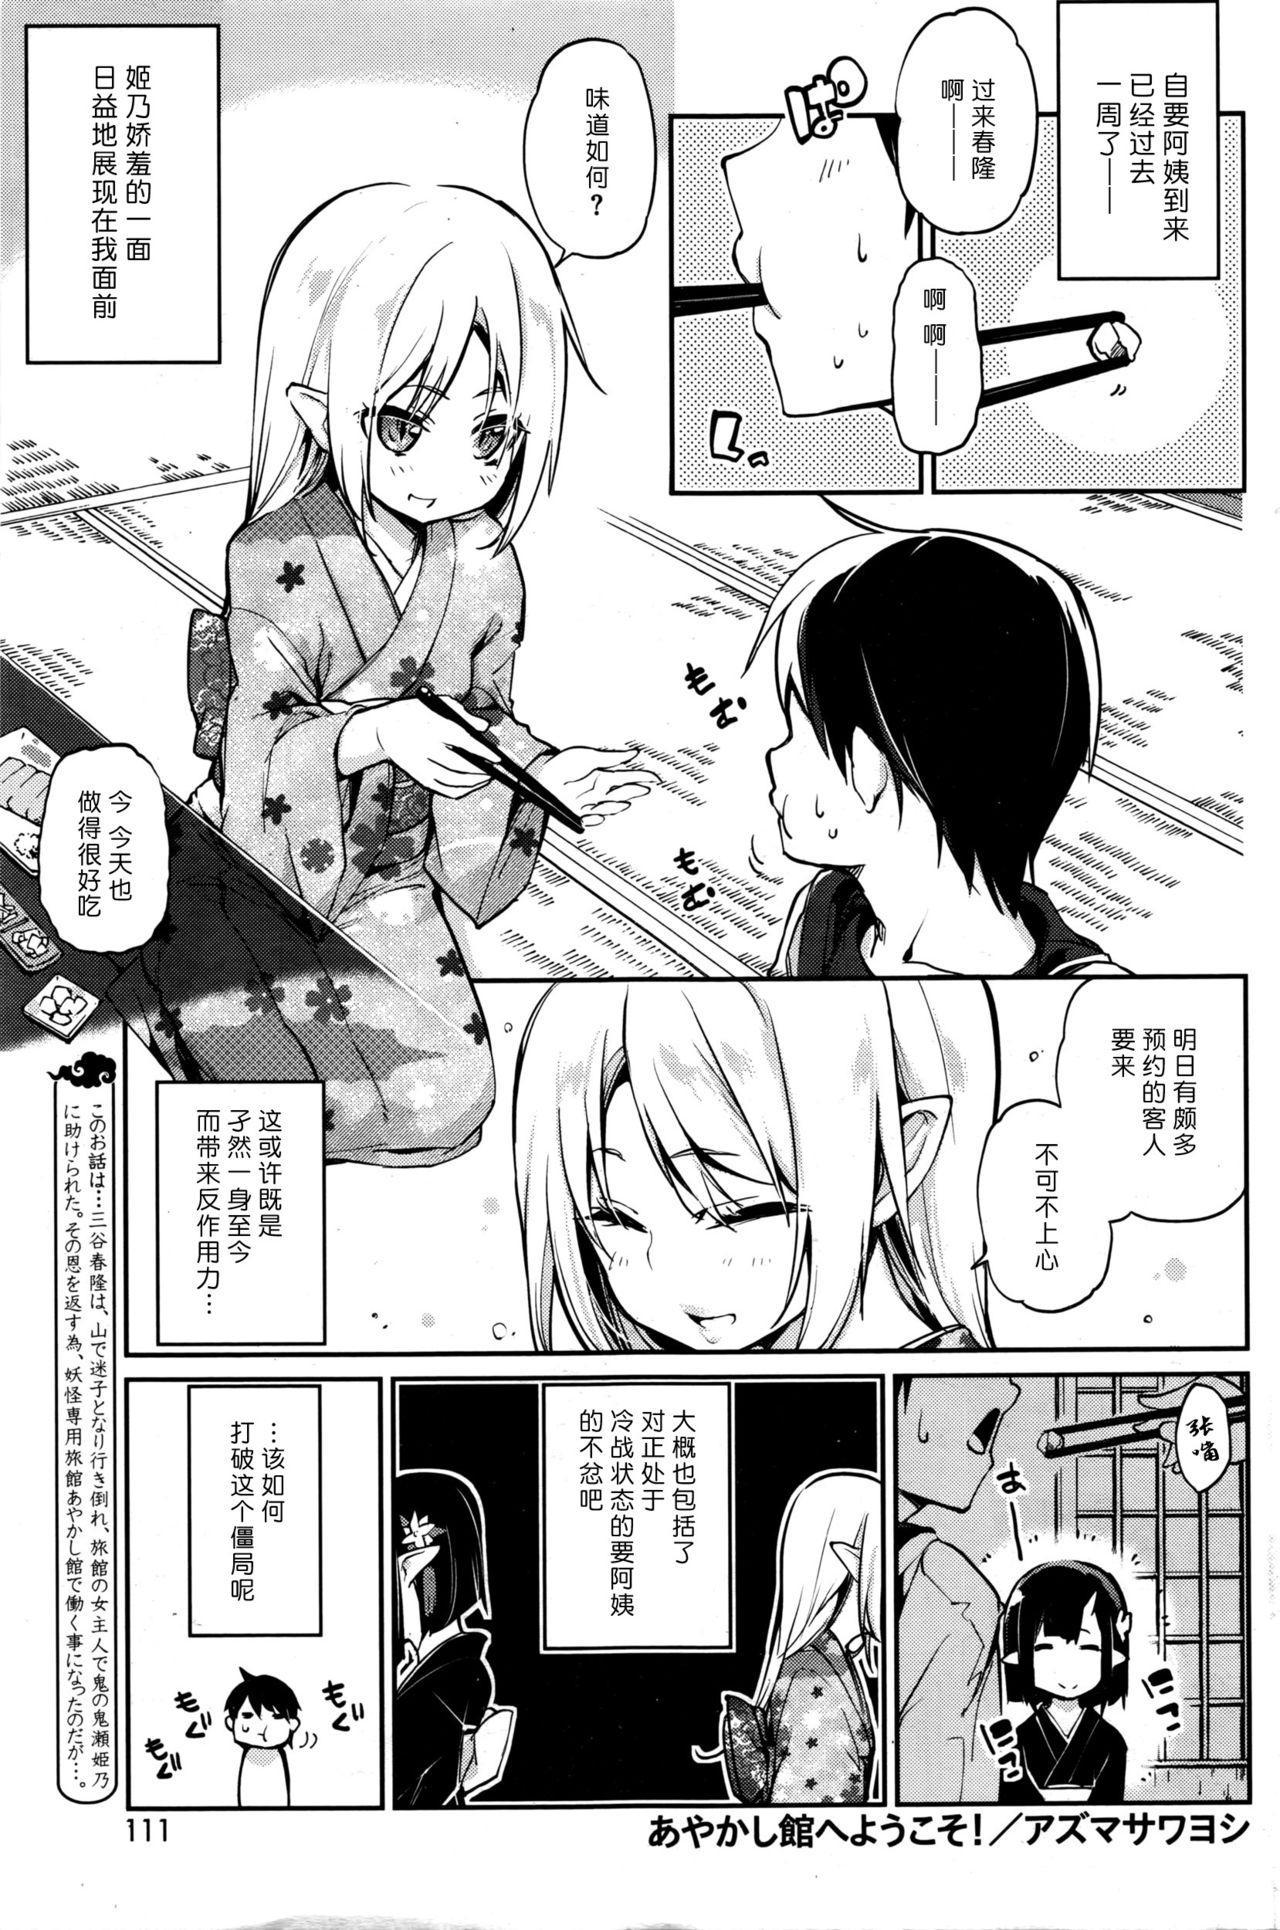 Ayakashi-kan e Youkoso! Ch. 7 0